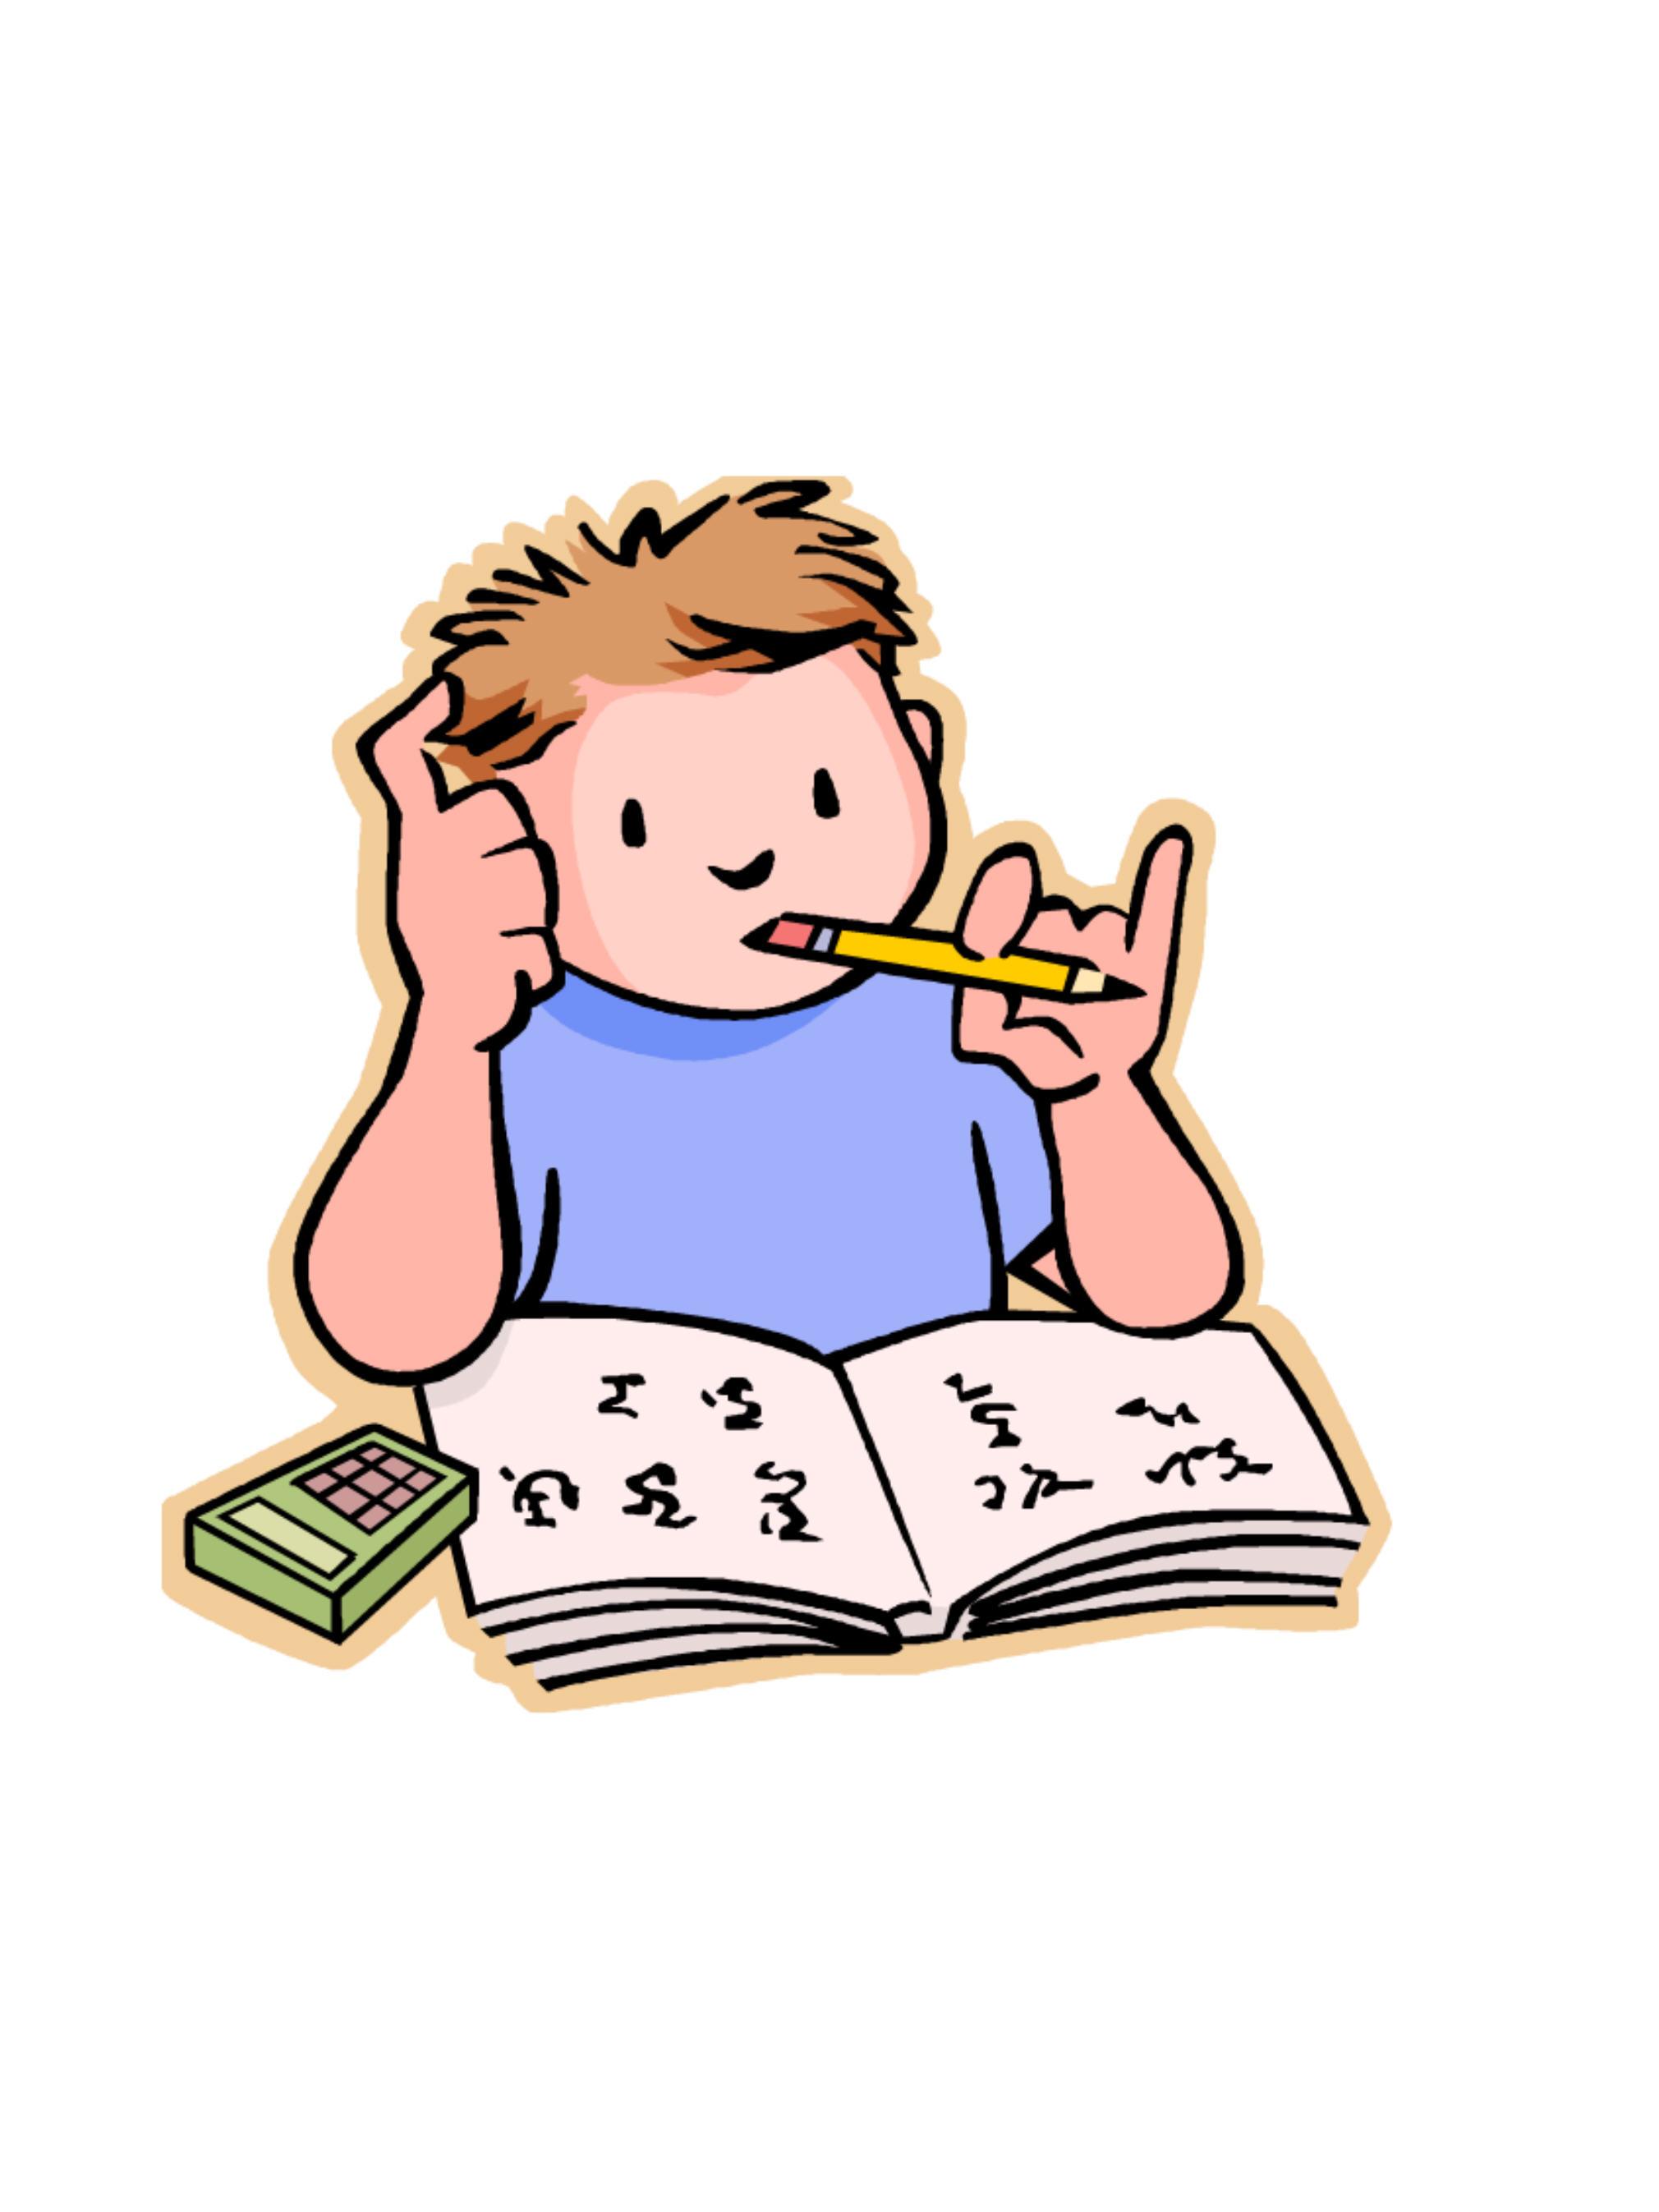 Doing homework homework clipart free clip art images